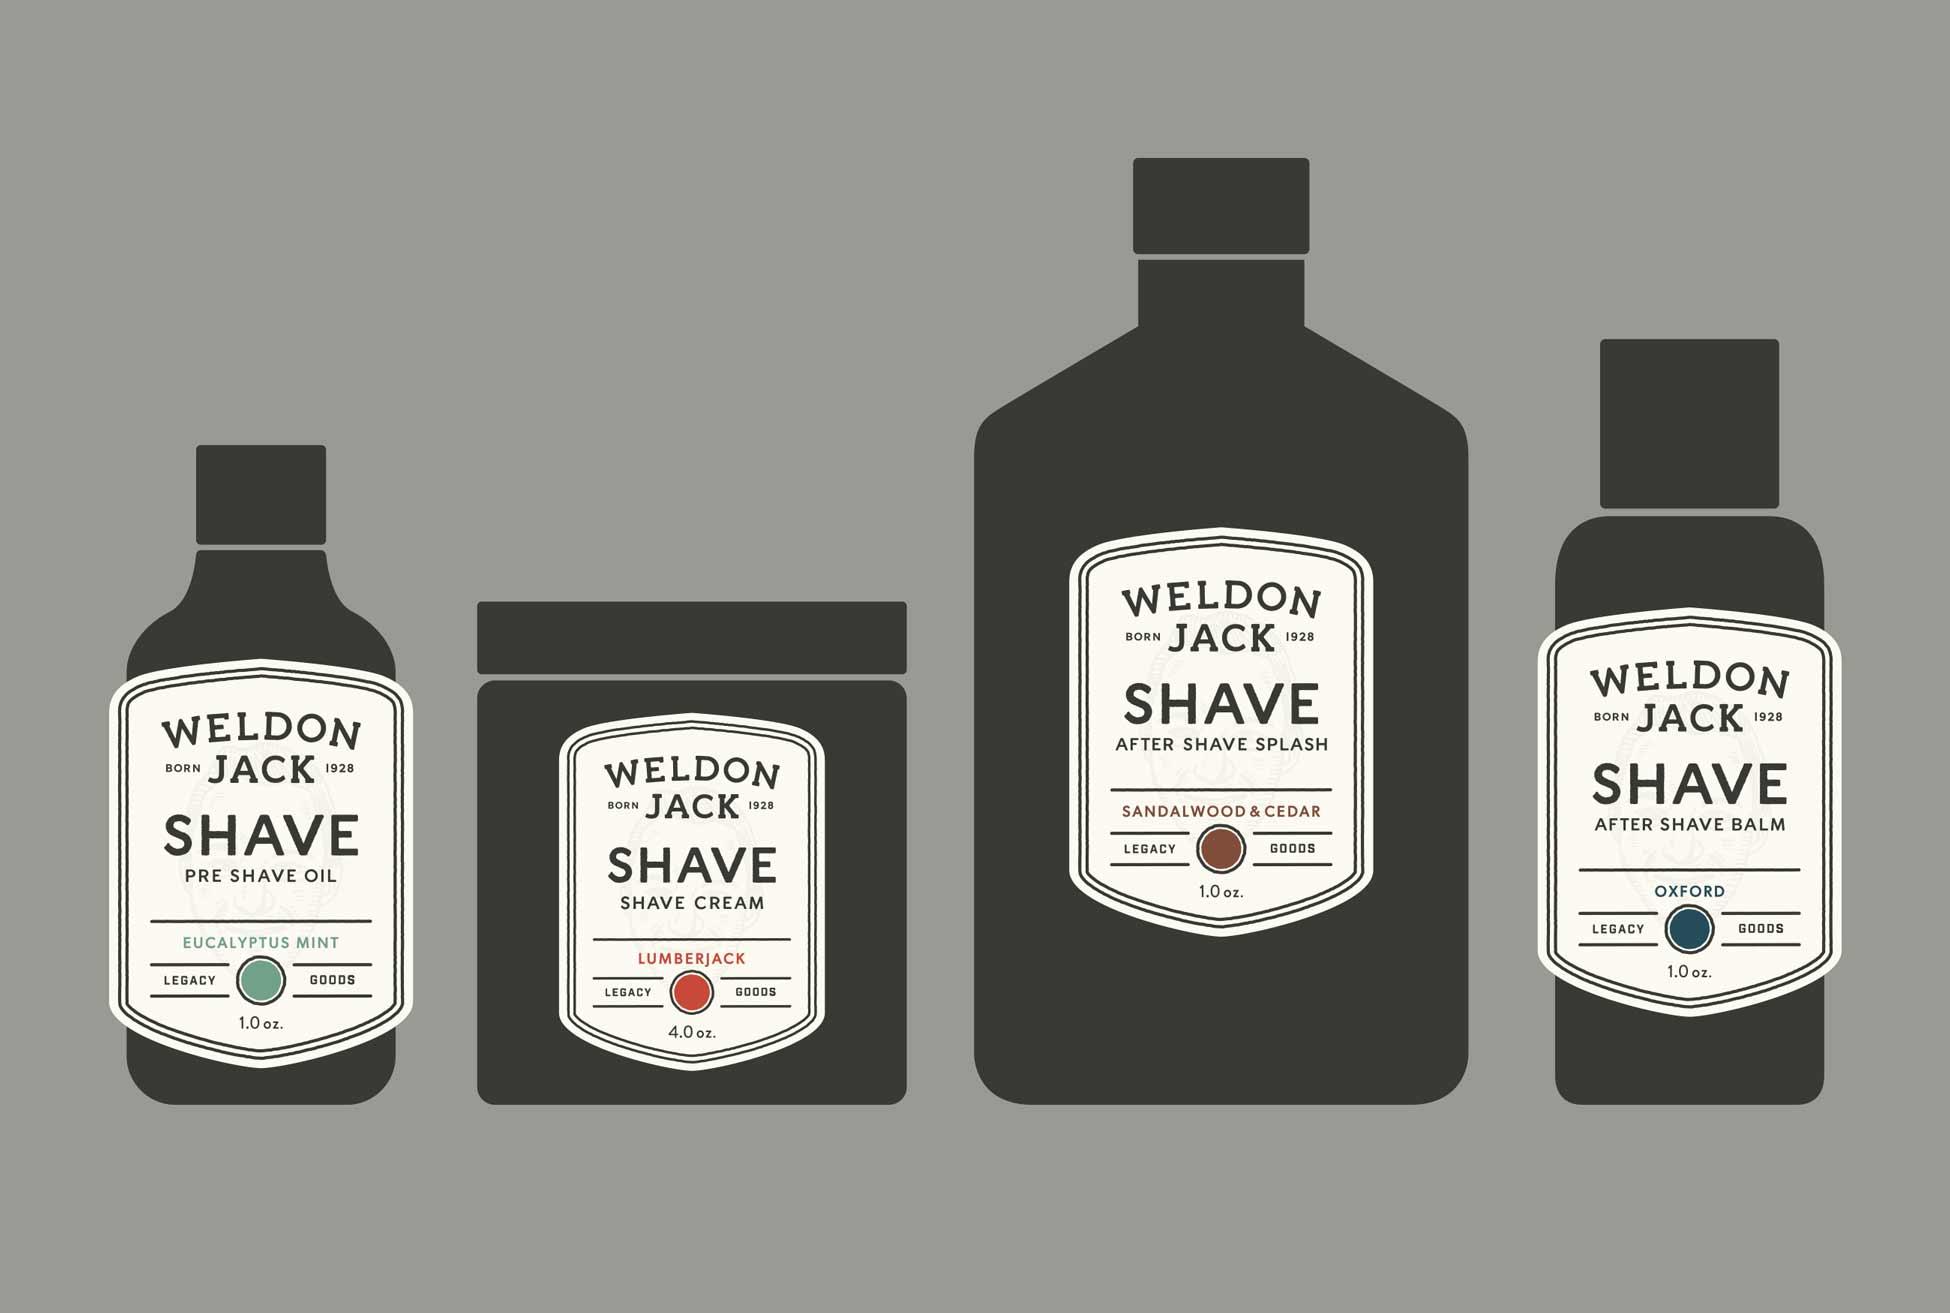 weldonjack_label-system-shave.jpg